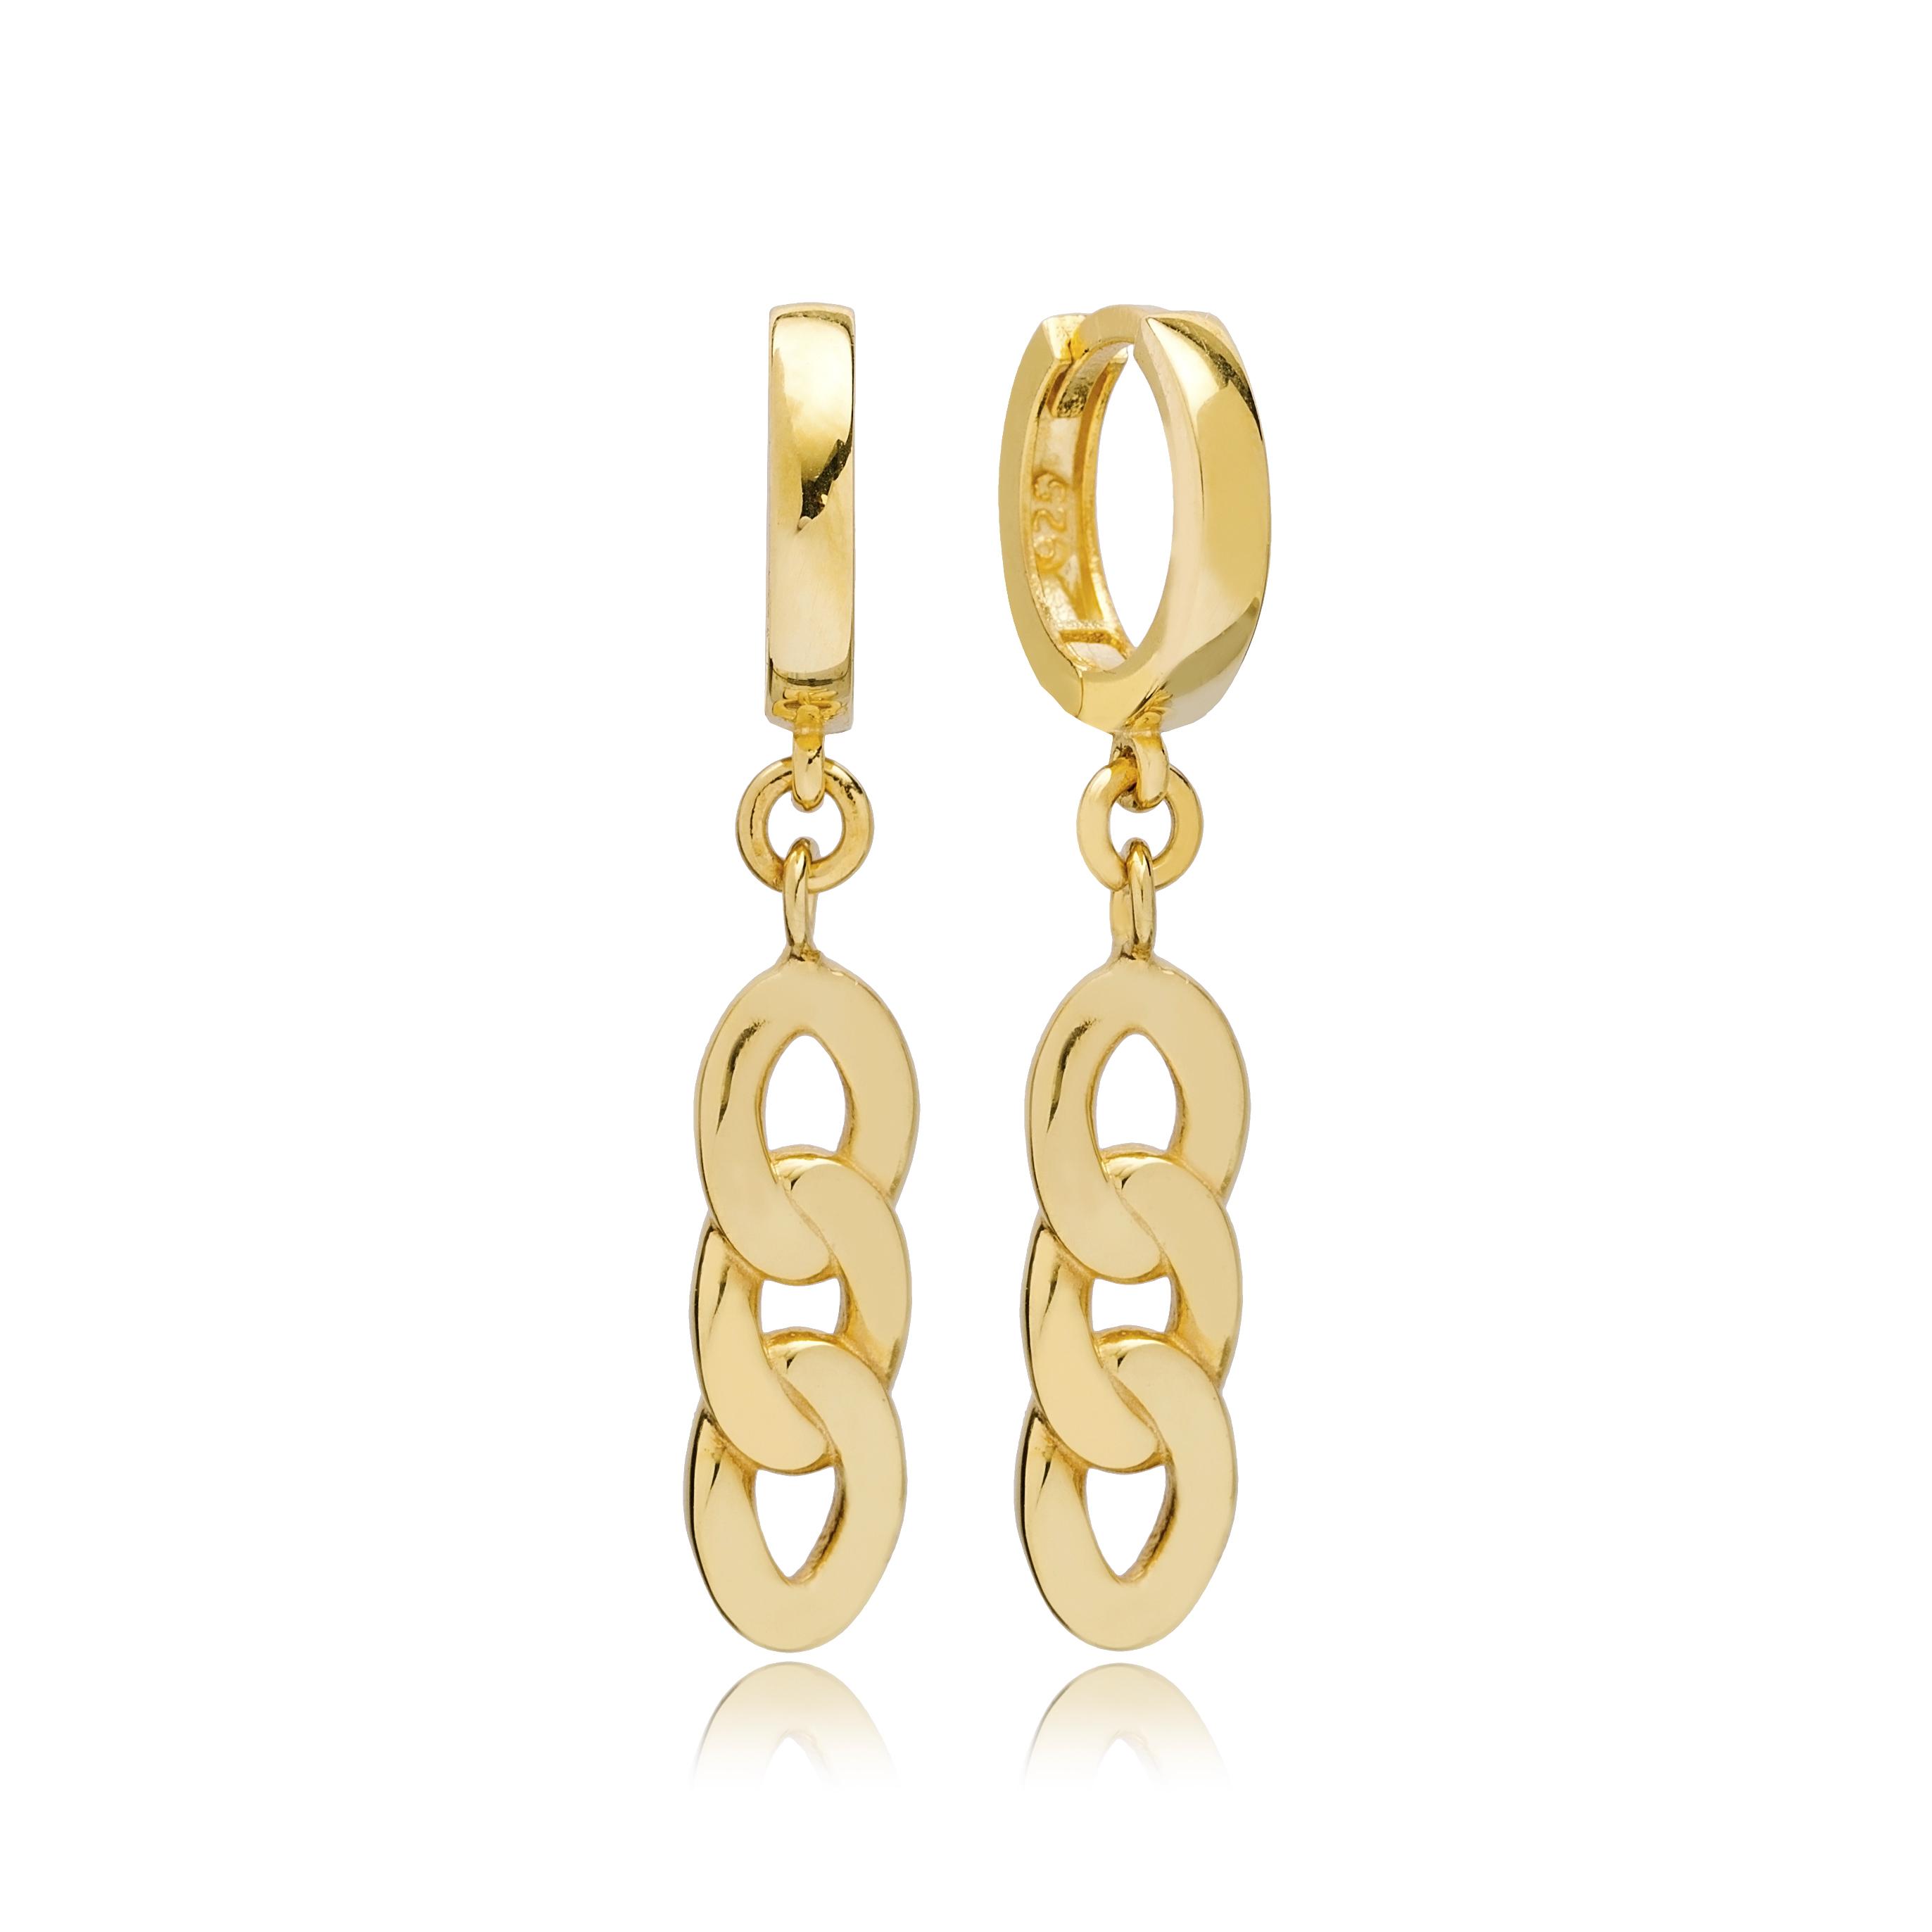 Rope Design Charm Dangle Earring Turkish Handmade 925 Sterling Silver Jewelry